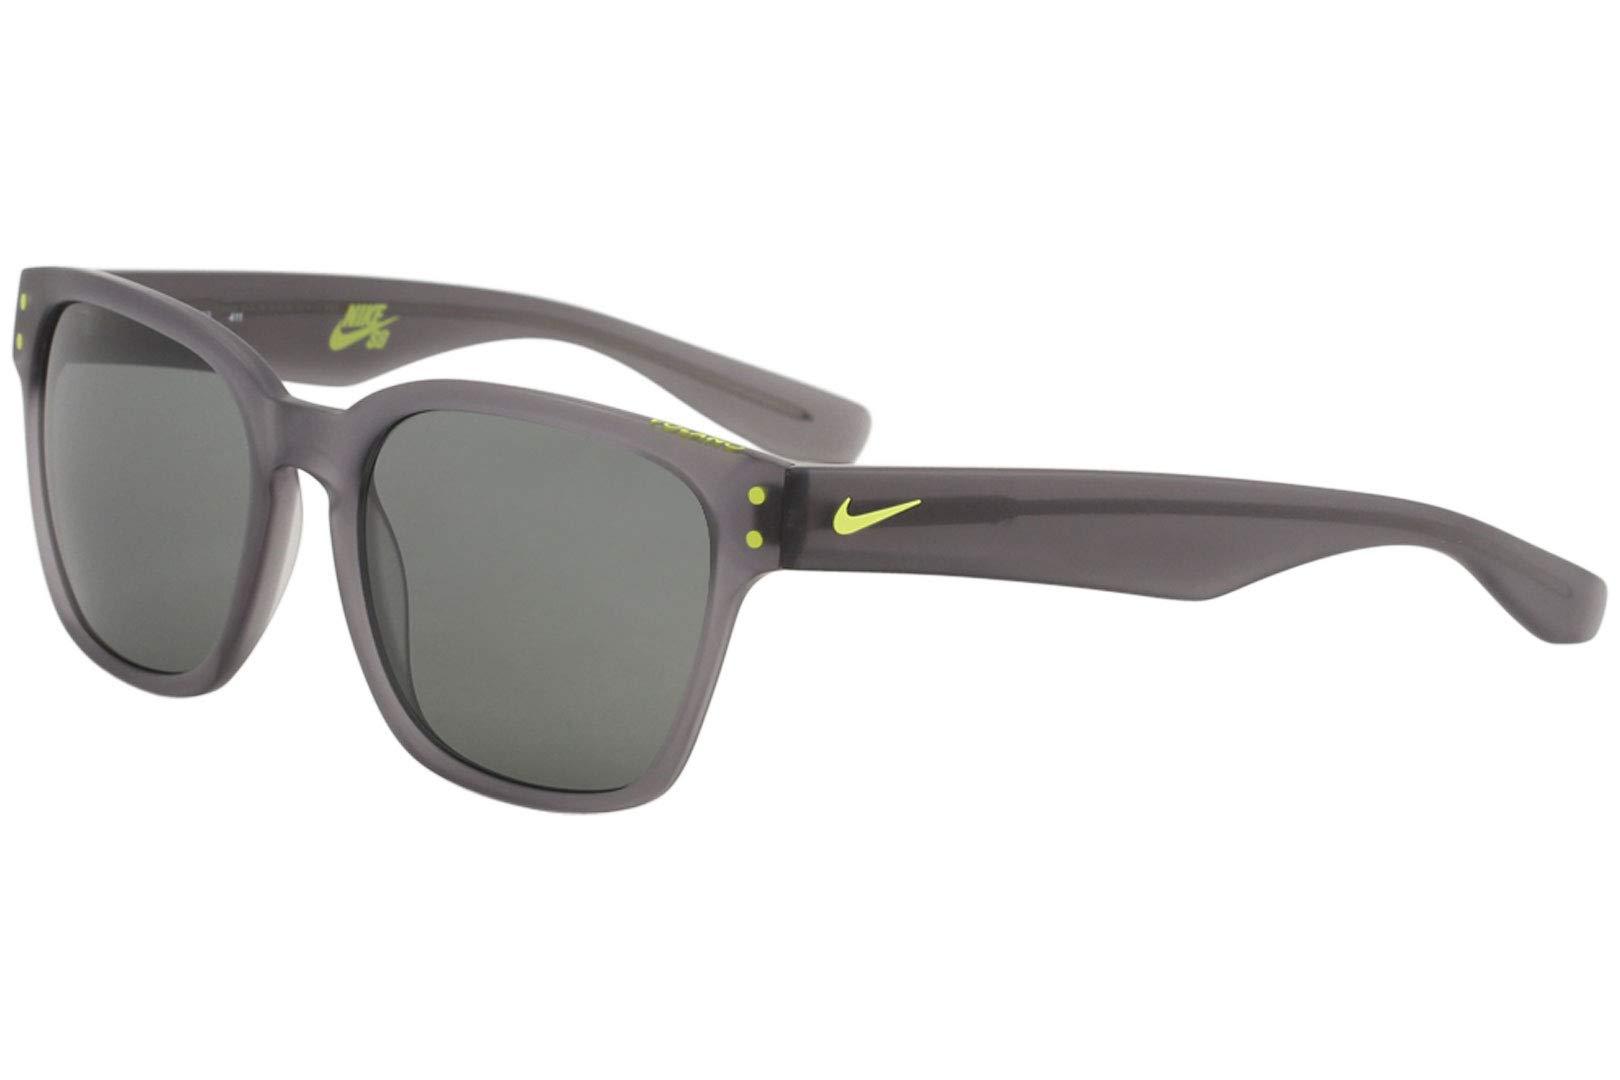 Nike EV0877-003 Volano Sunglasses (One Size), Matte Crystal Grey/Cyber, Grey Lens